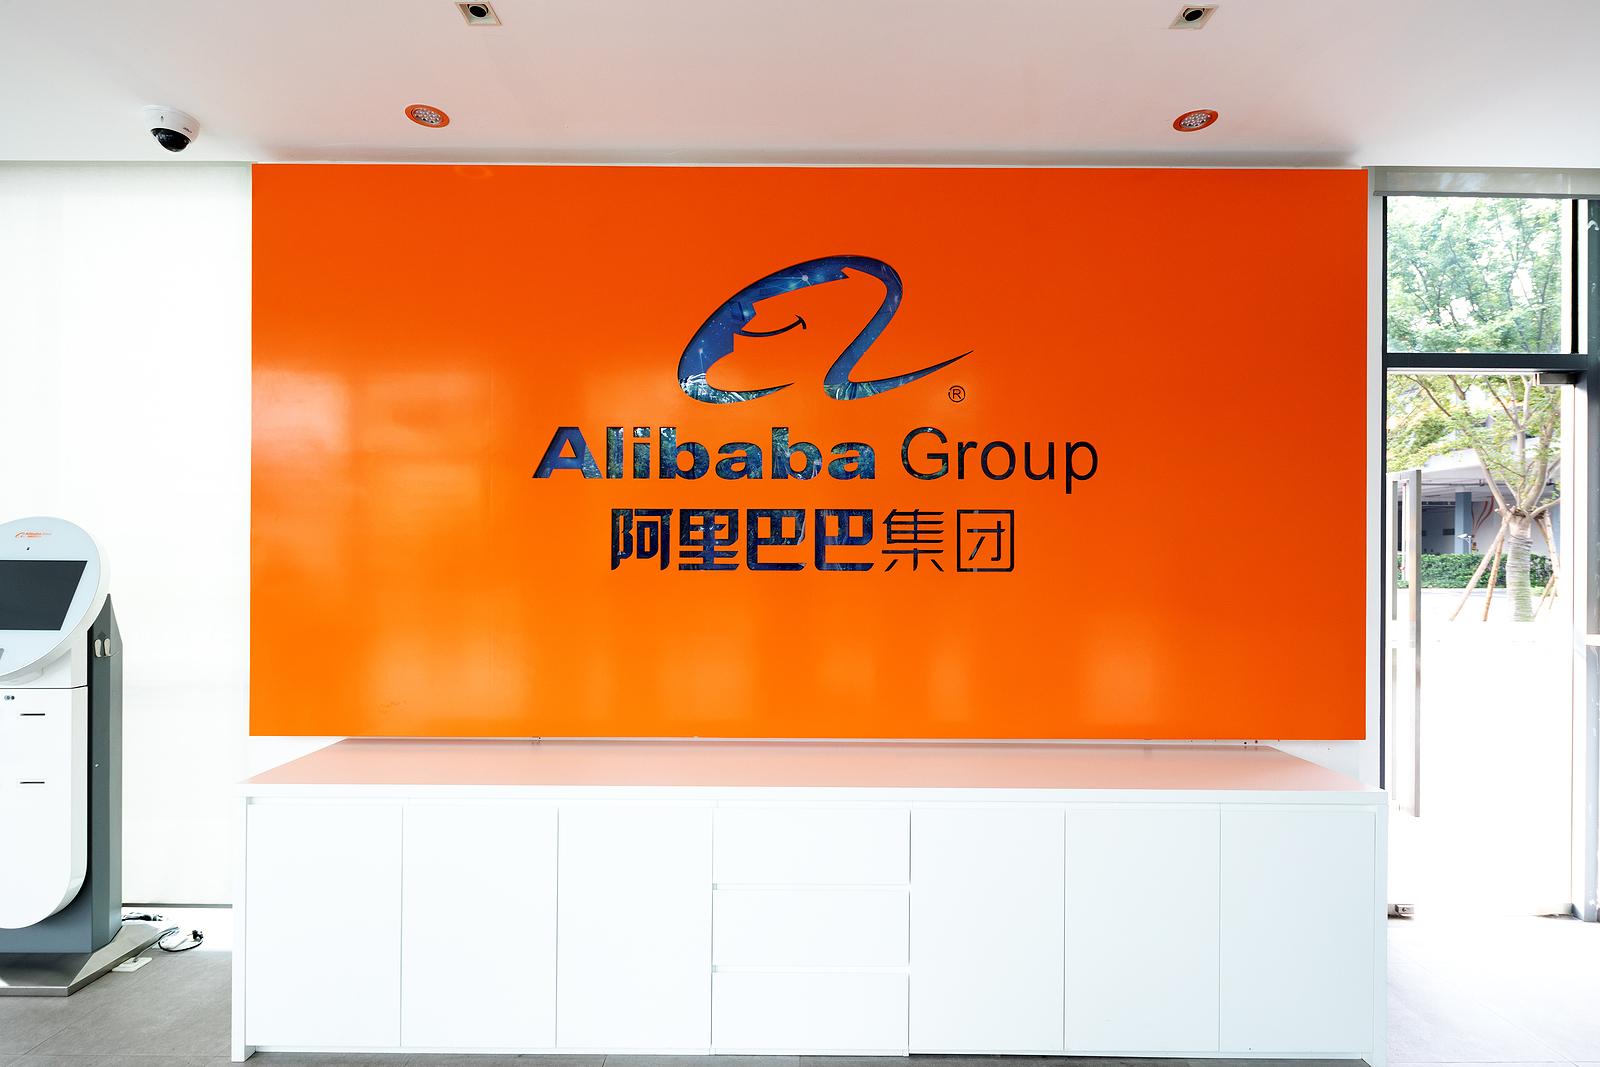 Alibaba stock, BABA stock news and analysis